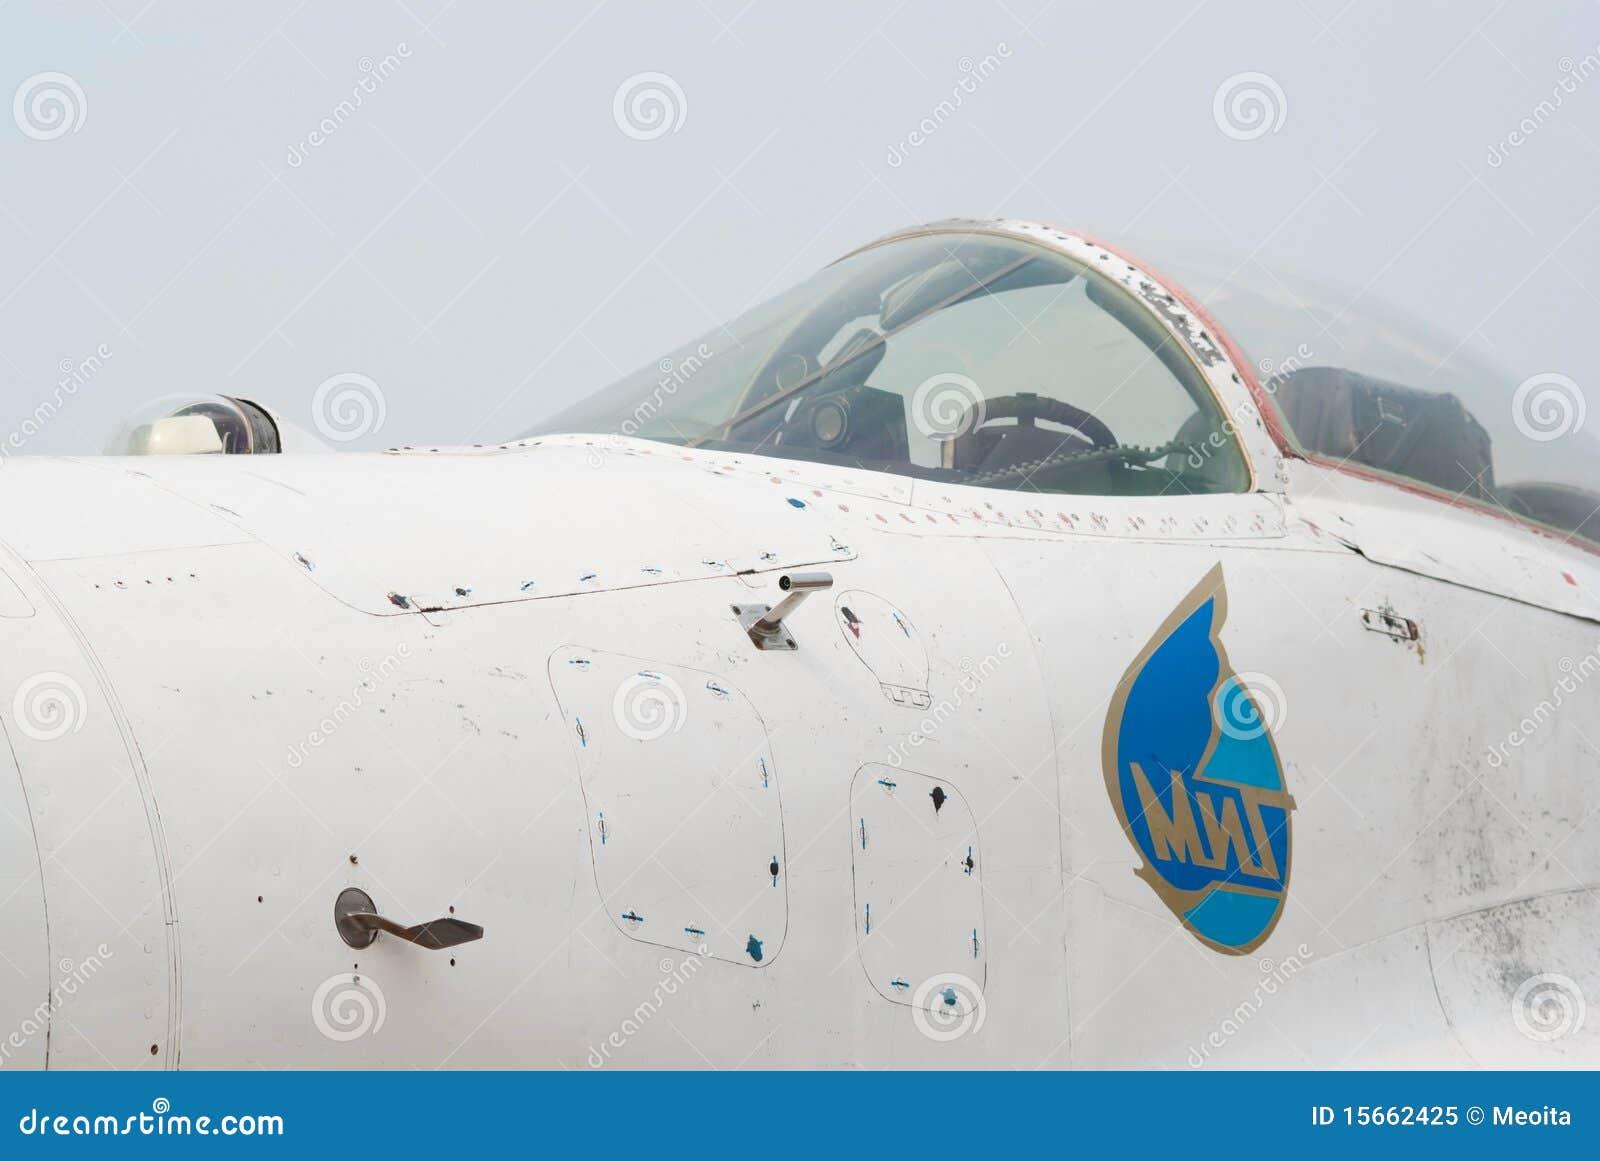 Cockpit of MiG-29 jet editorial image  Image of closeup - 15662425